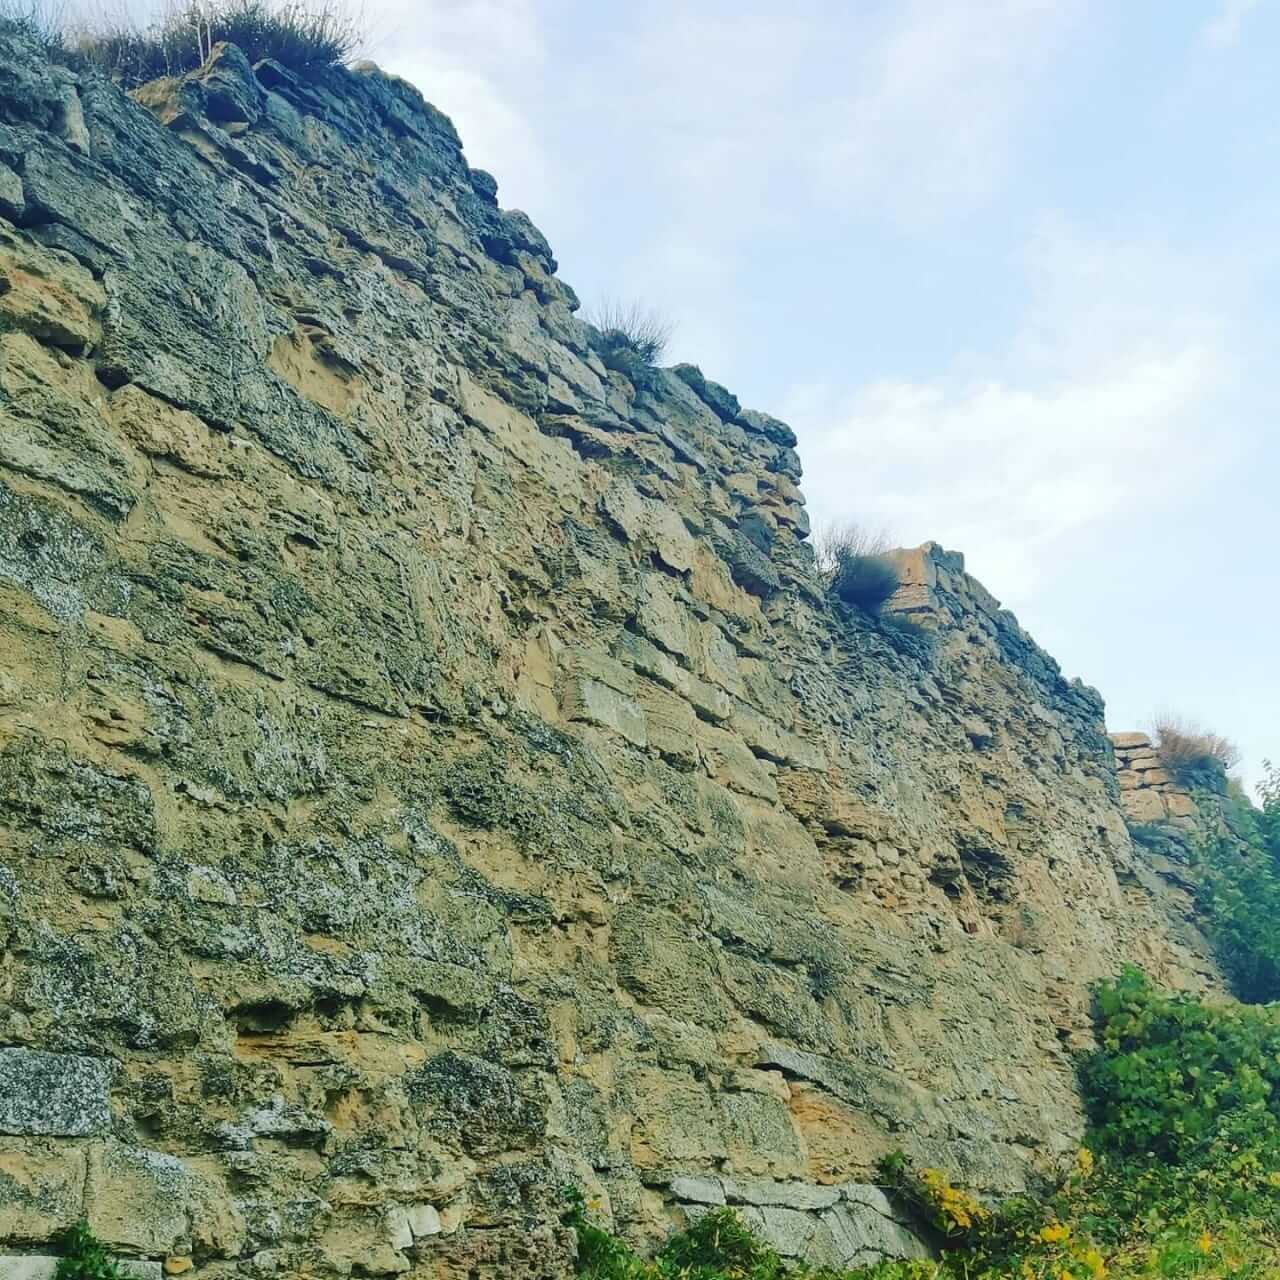 Стена за крепостью